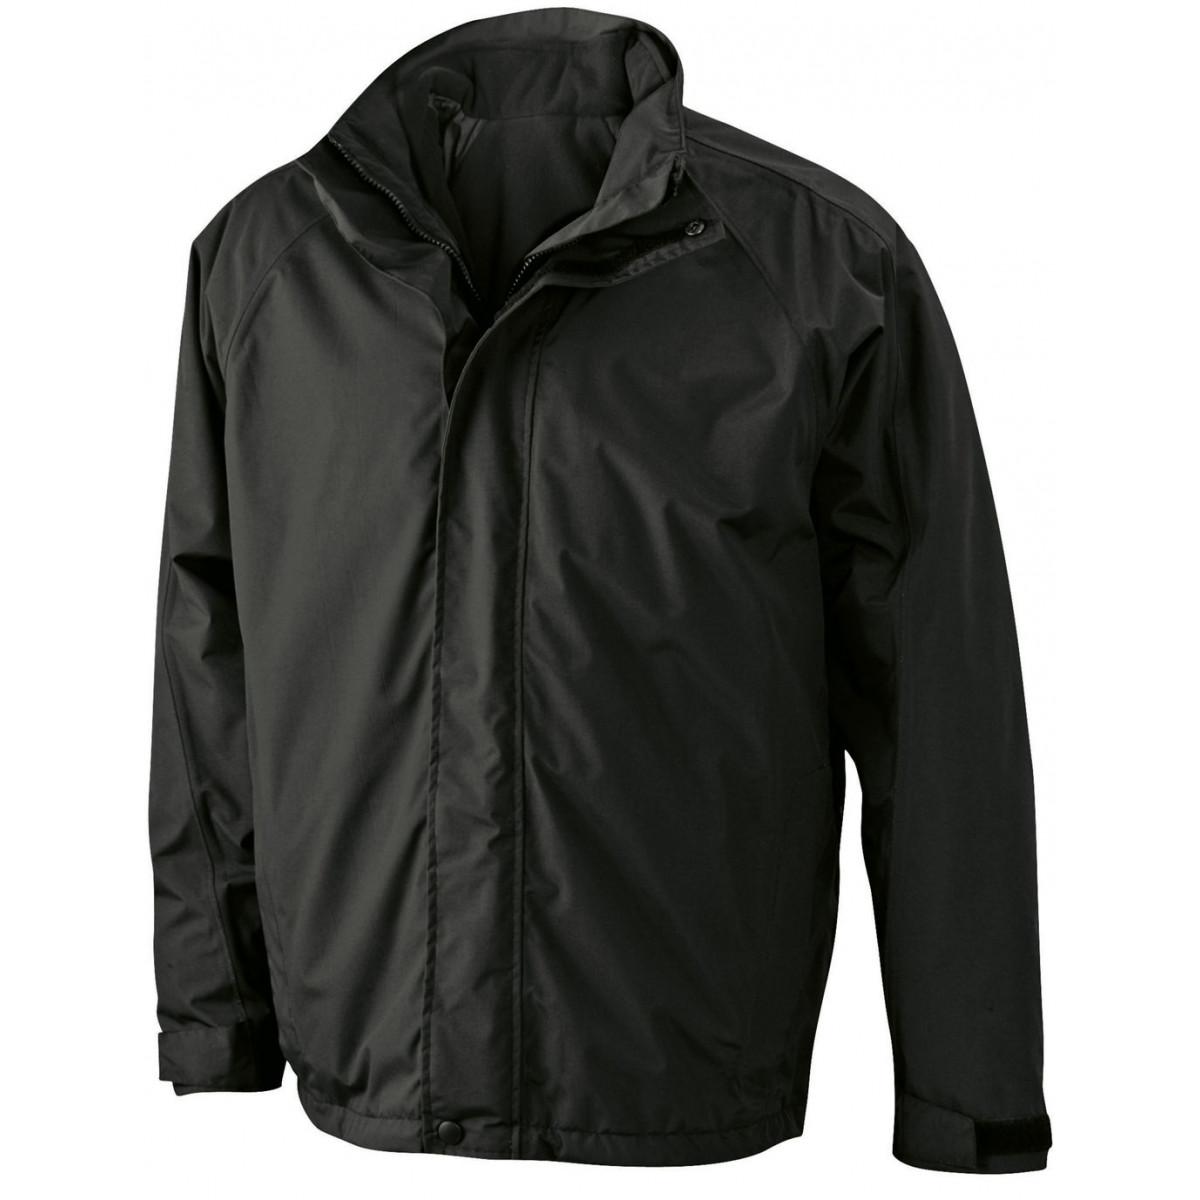 Куртка мужская JN170 Two-In-One Jacket - Черный/Черный